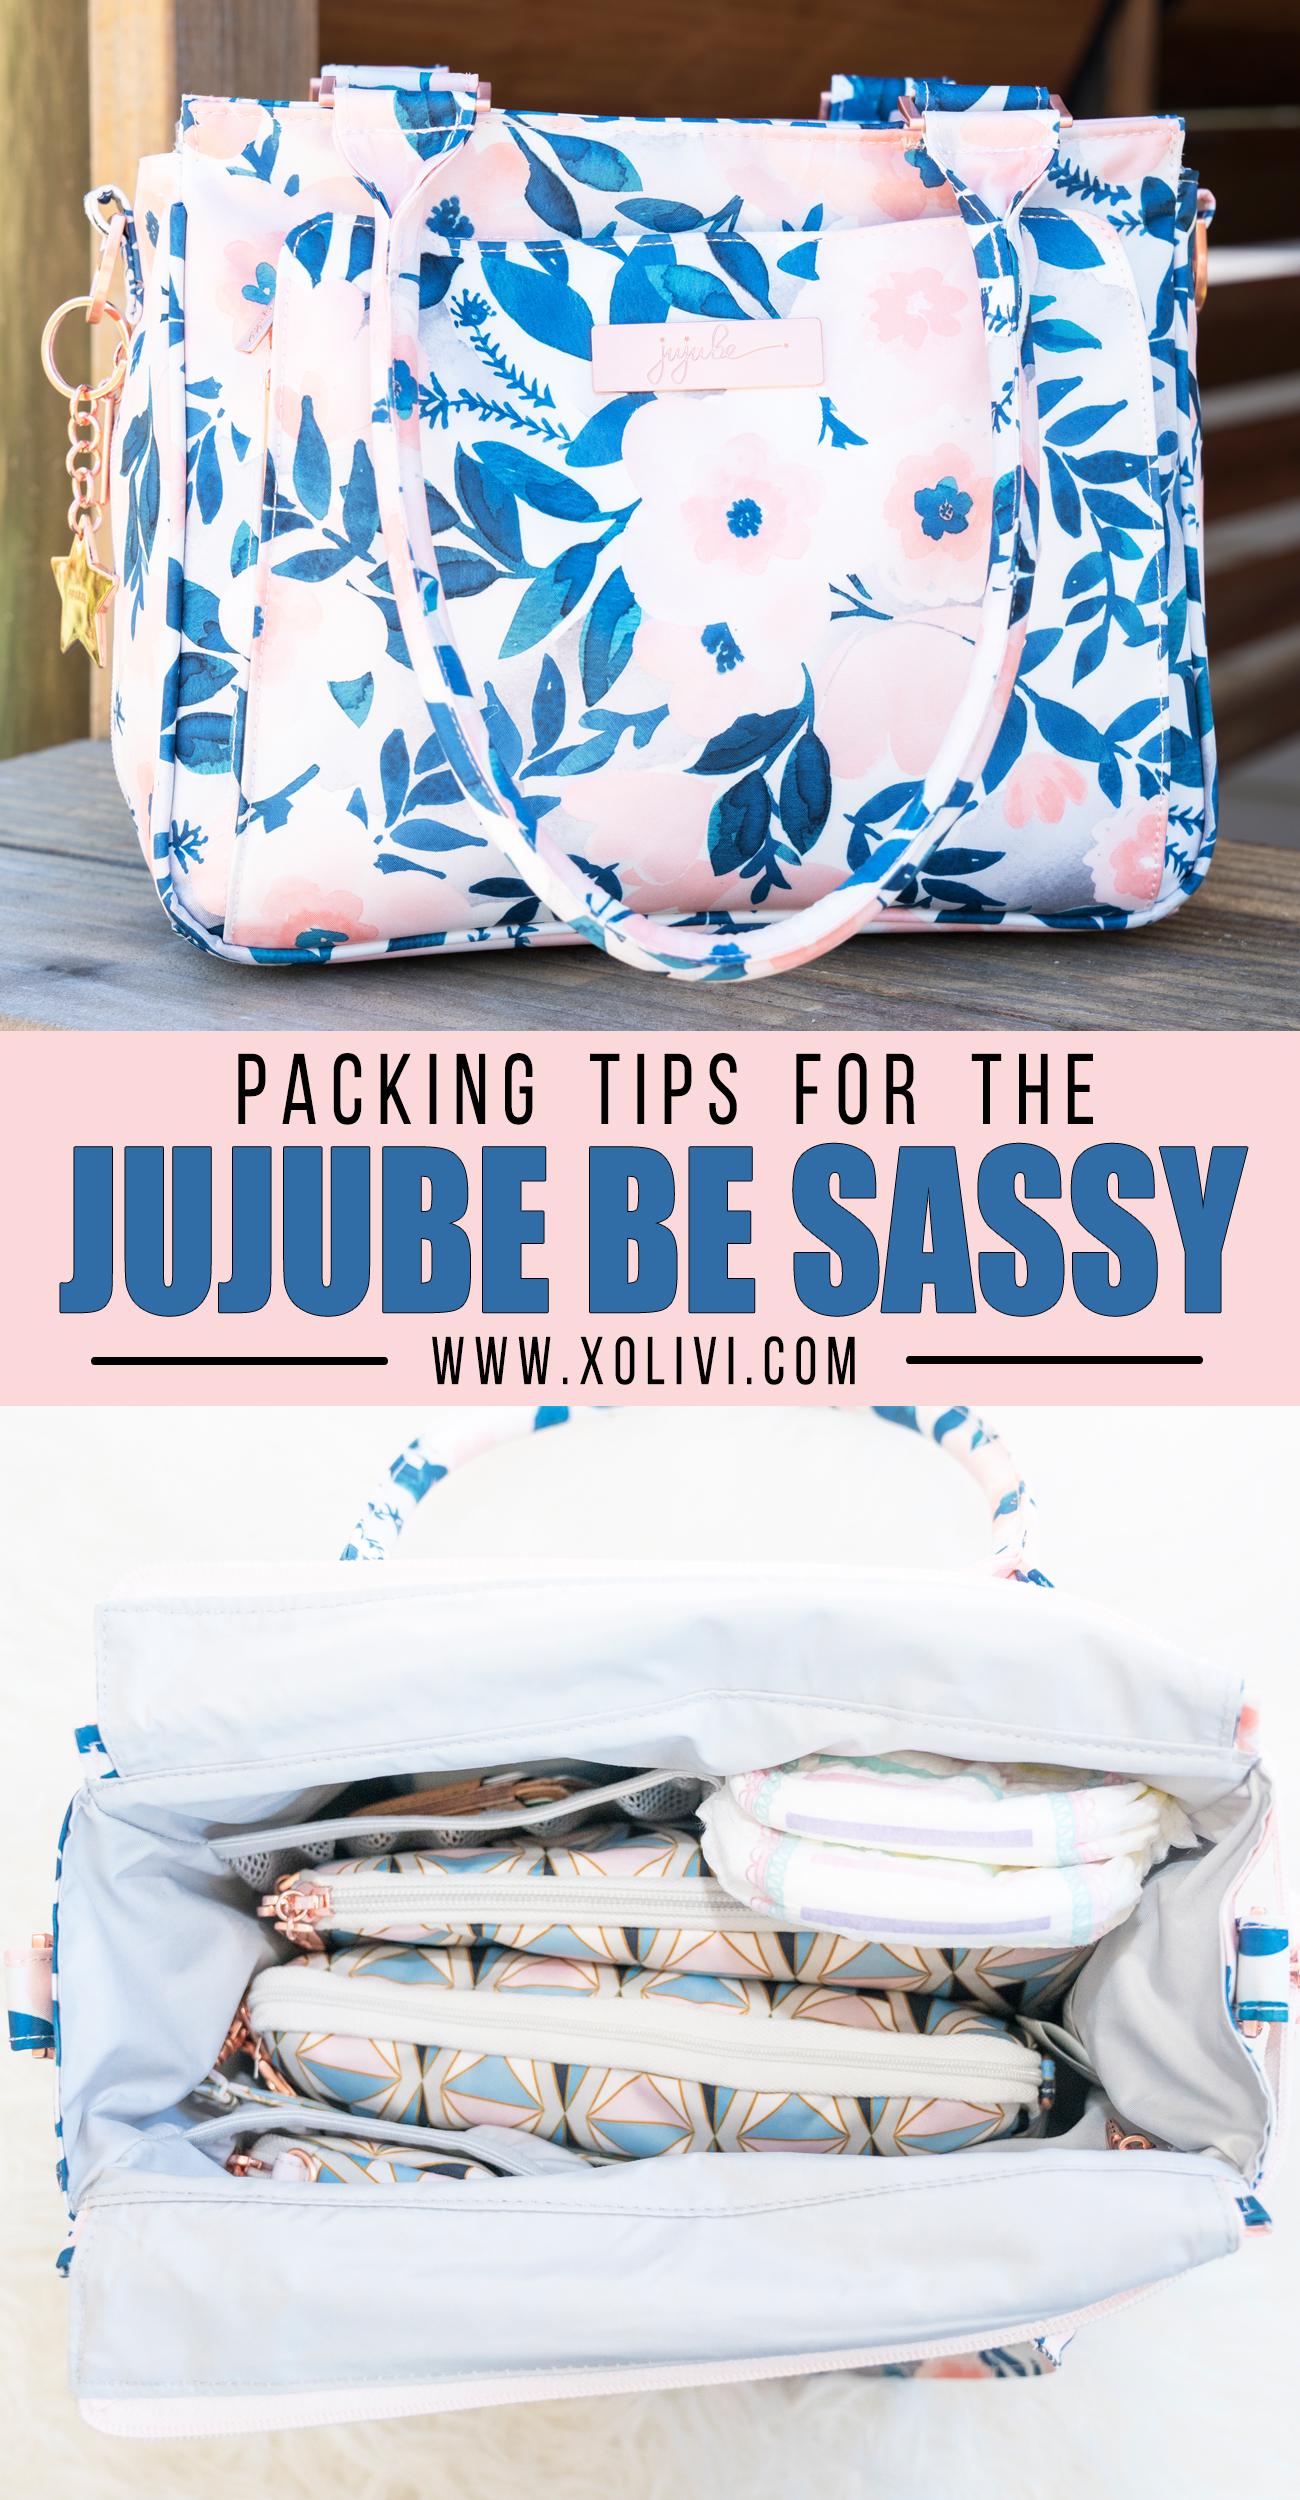 Jujube Be Sassy Whimsical Watercolor packing tips